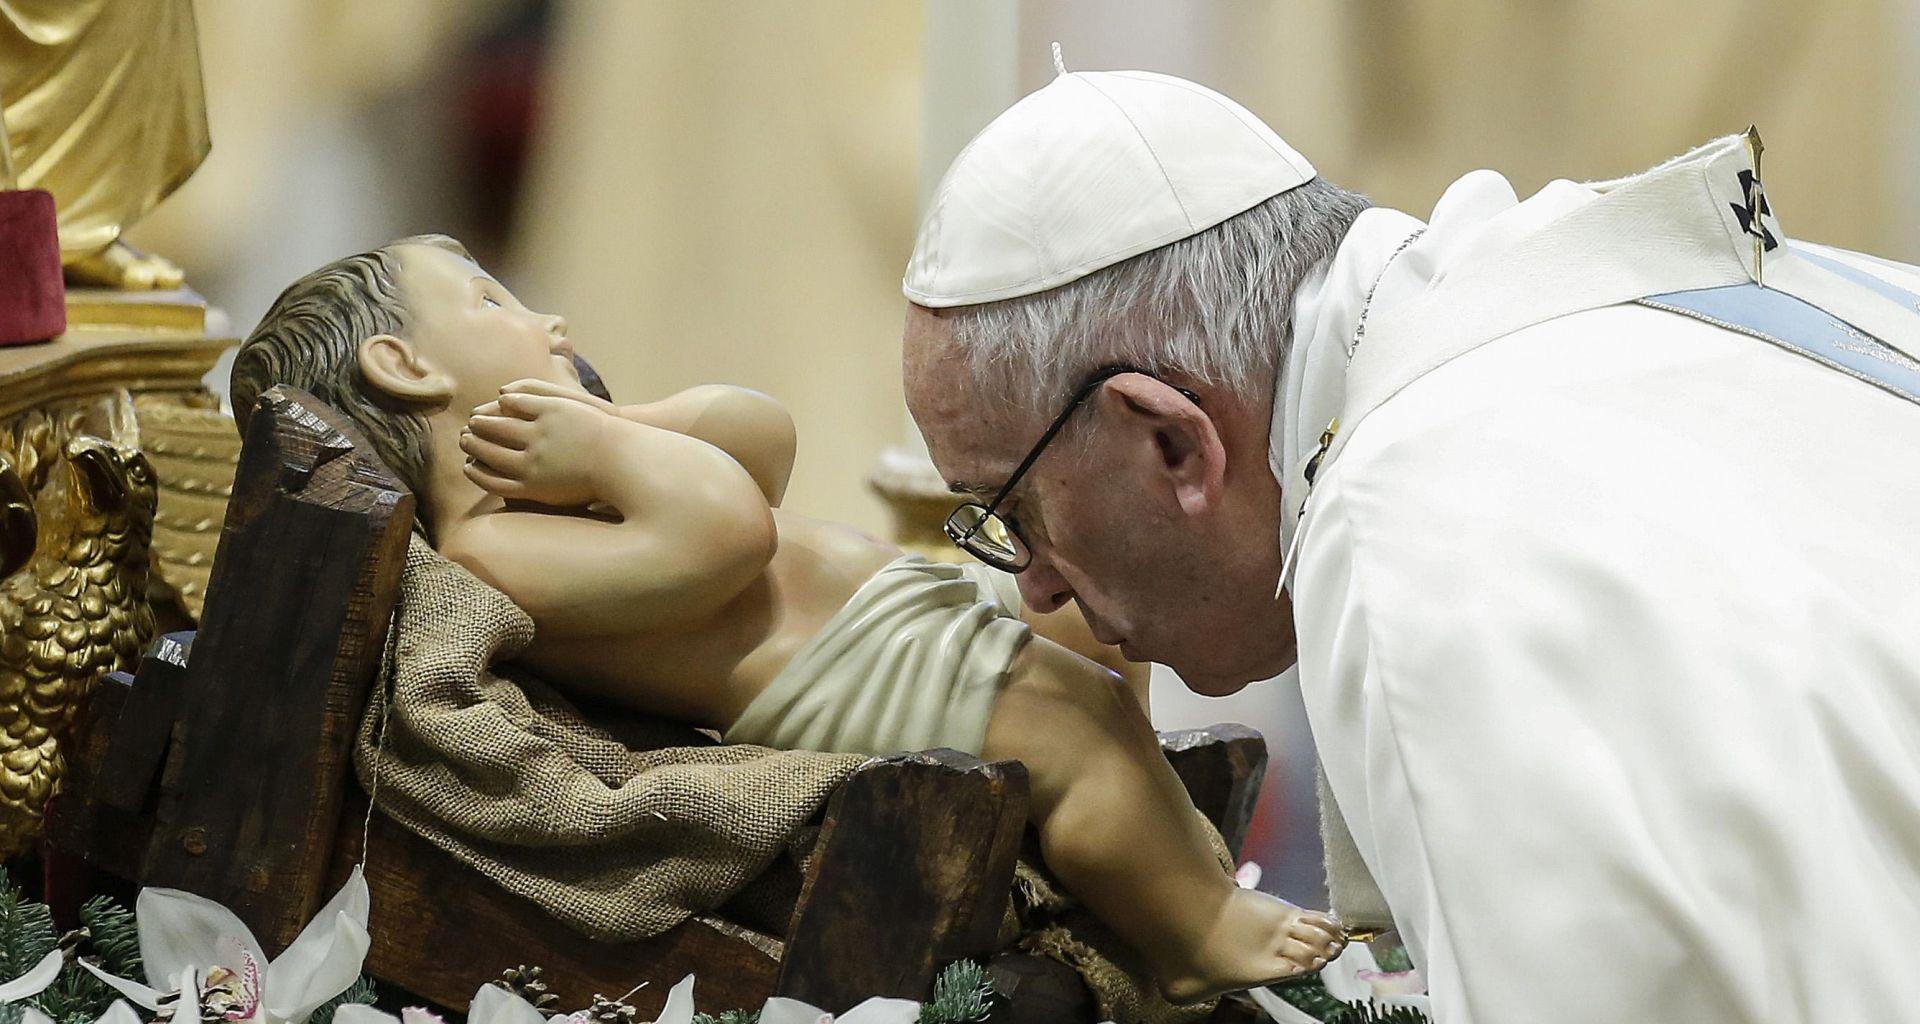 PREDATORI Papa Franjo kritizirao američke biskupe